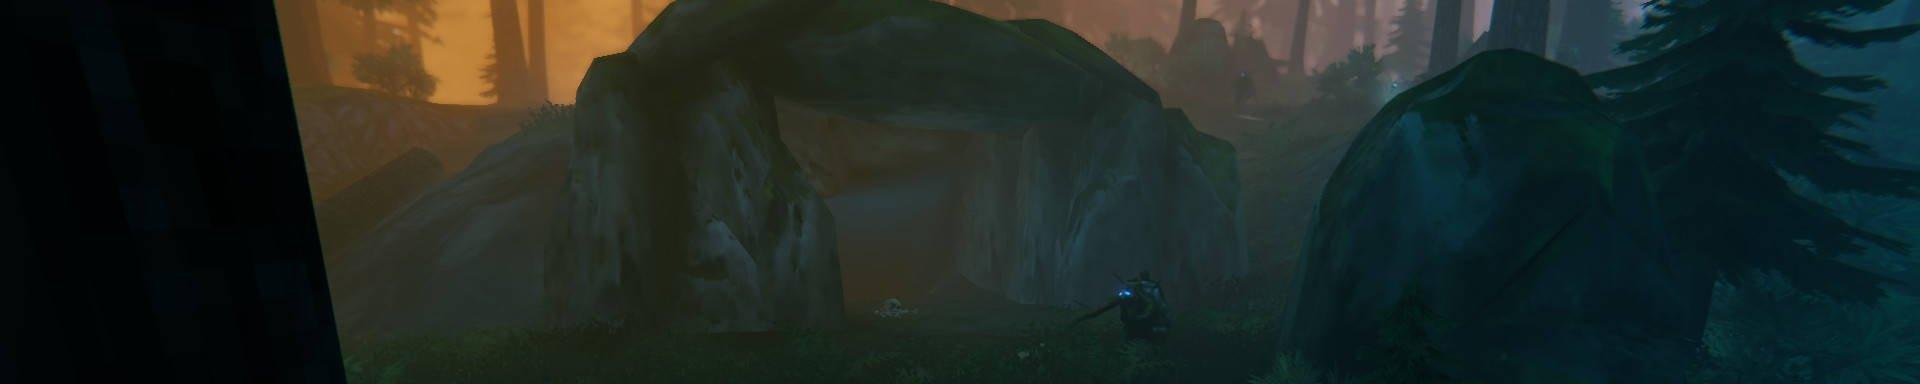 Valheim Troll Guide Trollhöhle